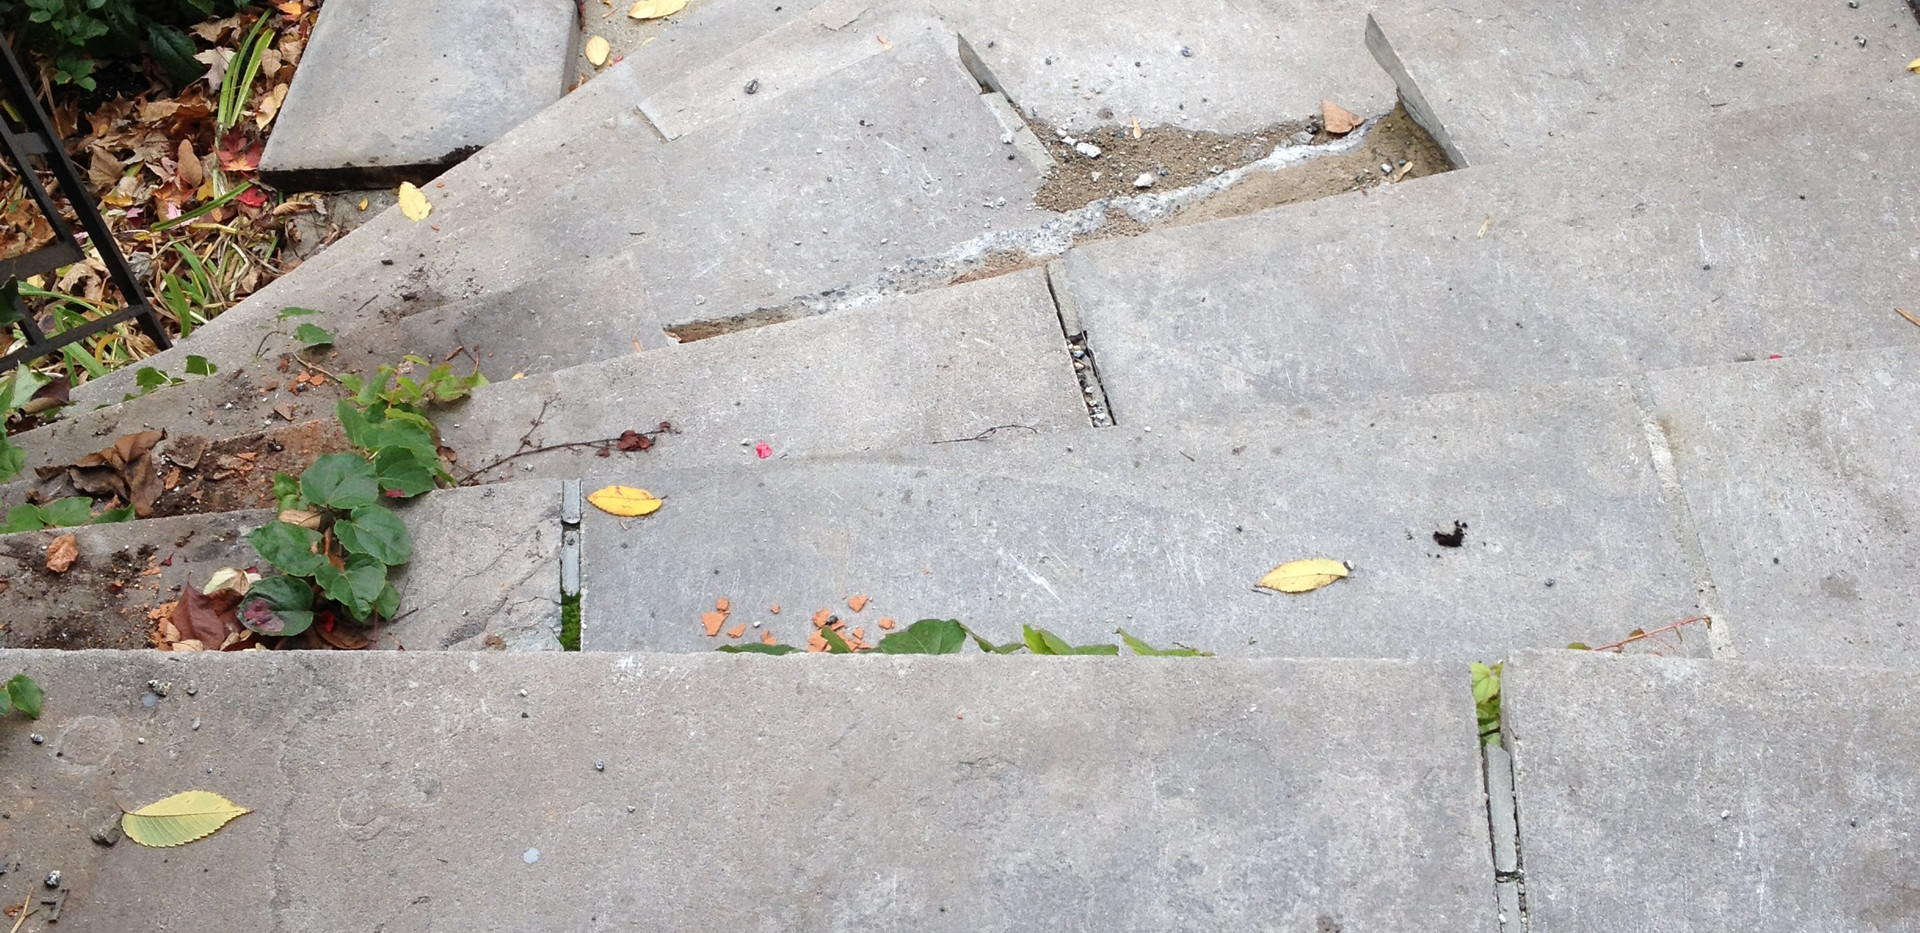 Escalier du palier de pierre